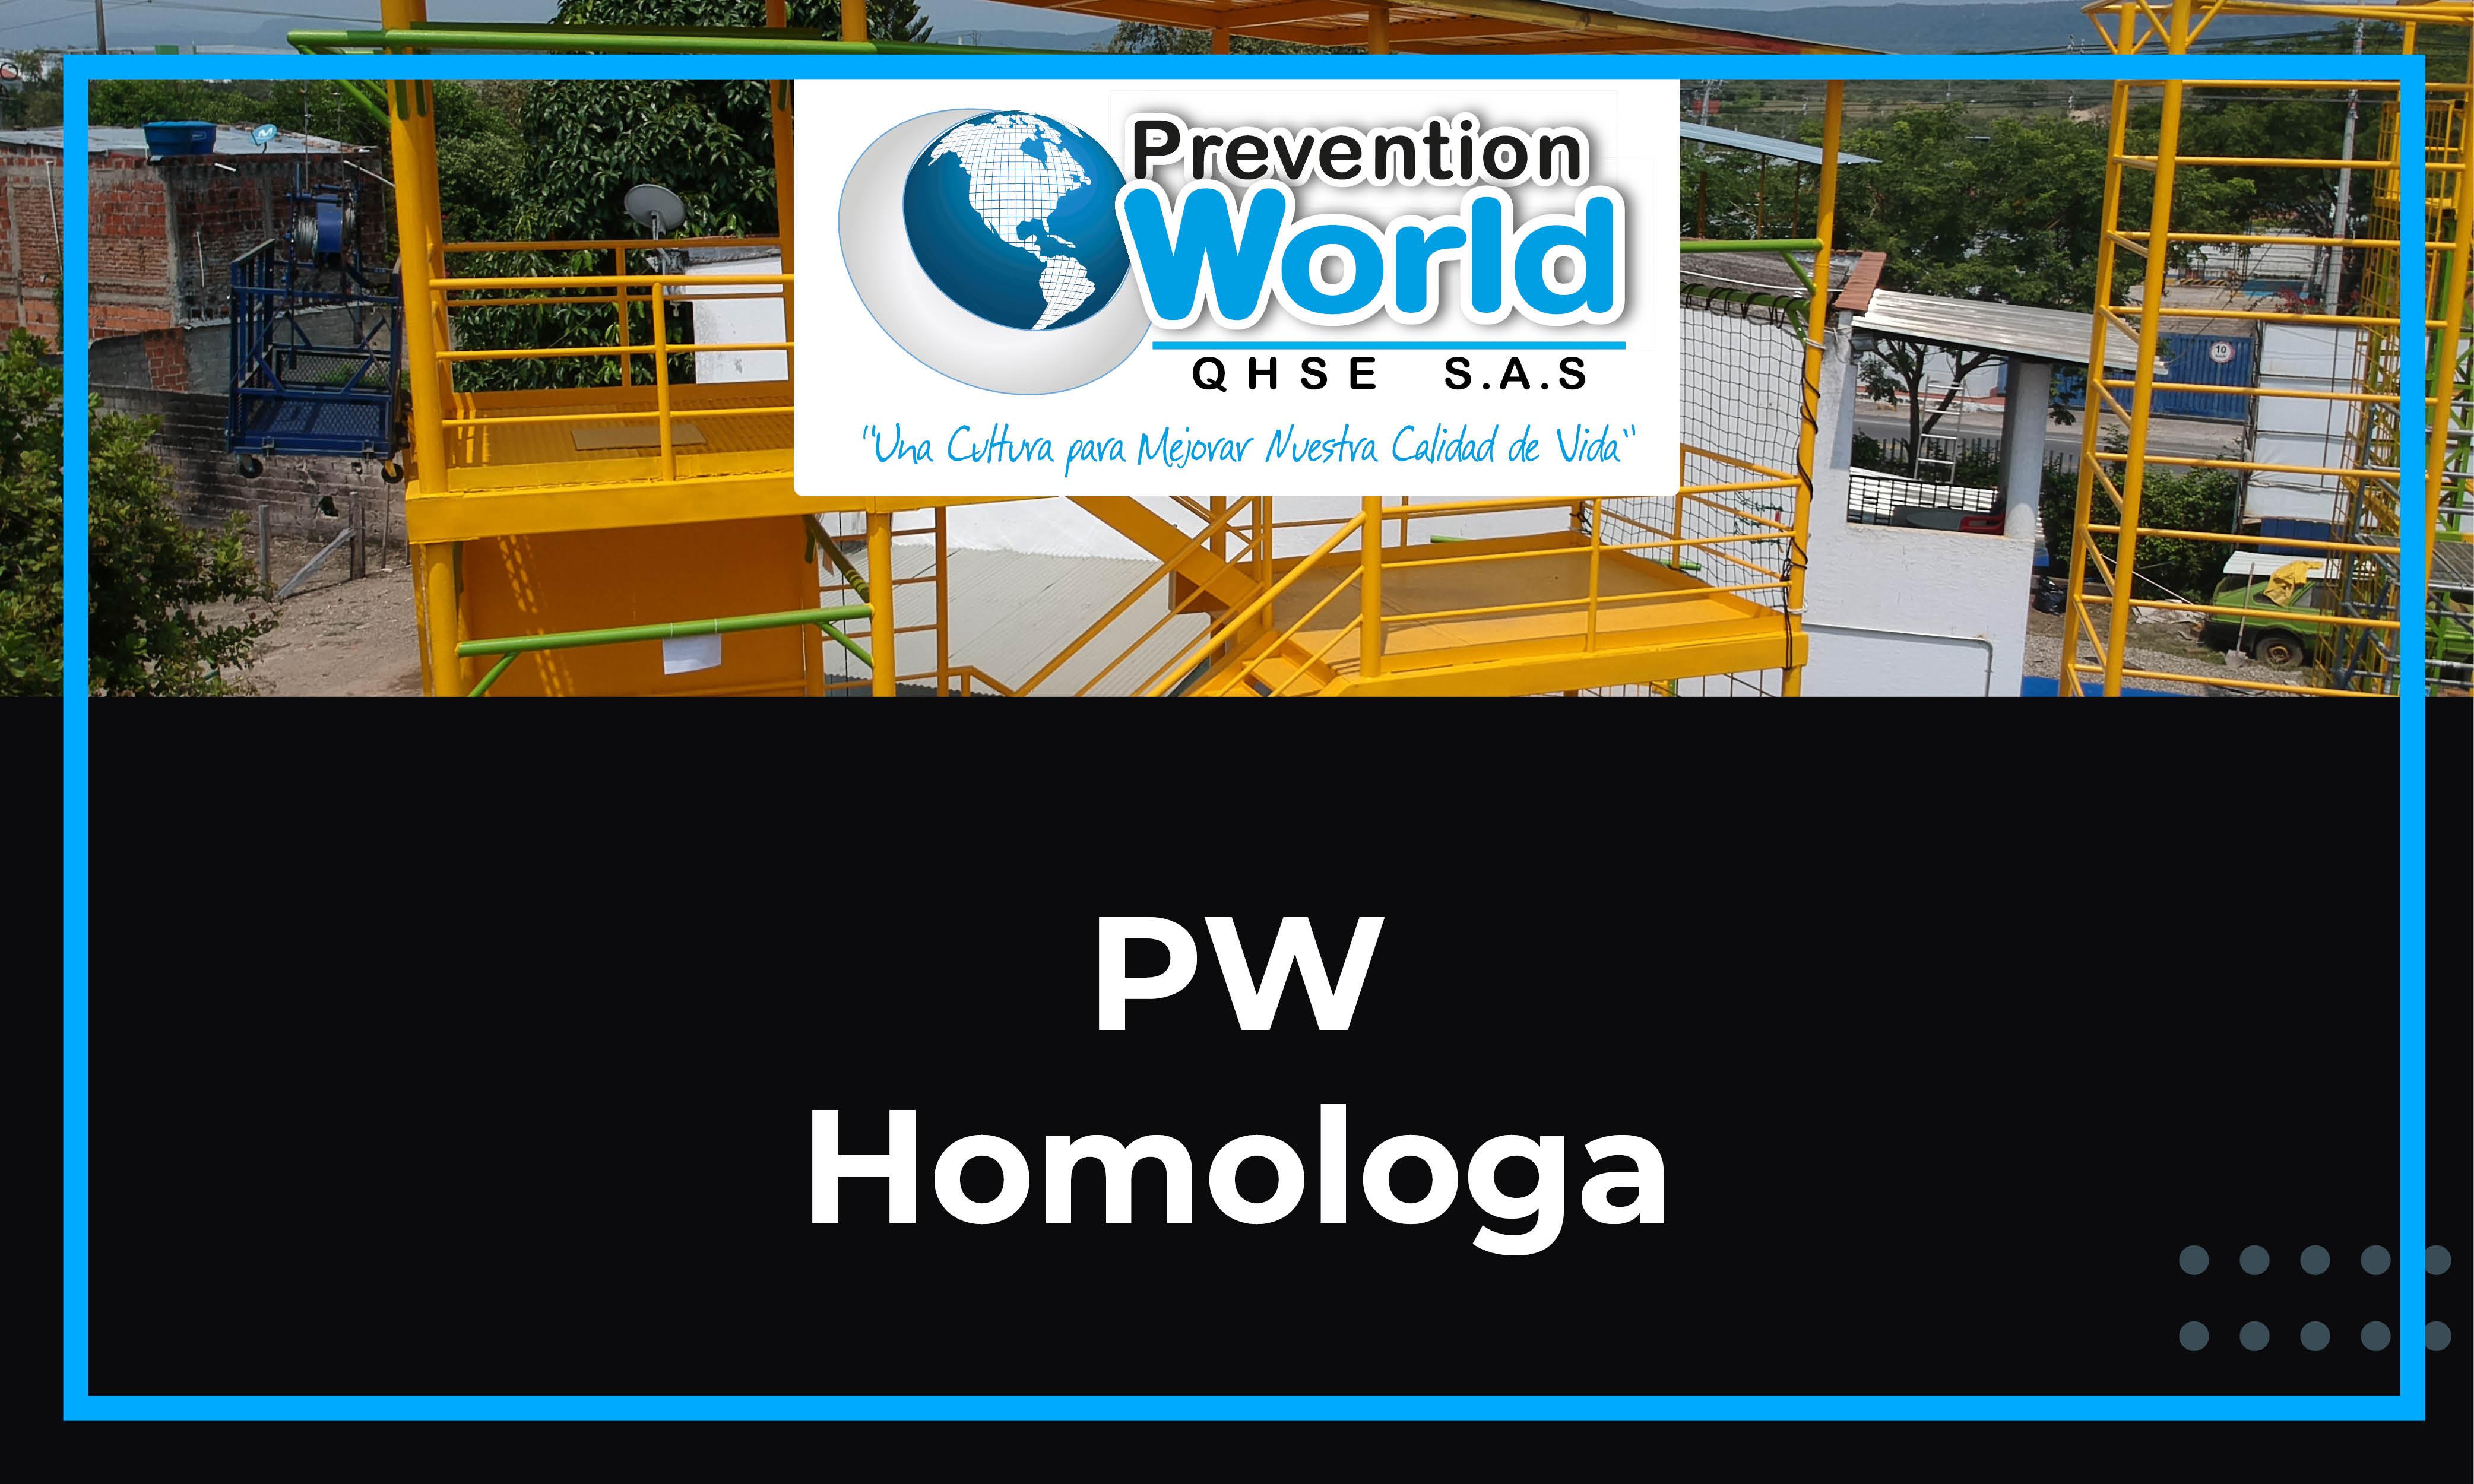 PW Homologa